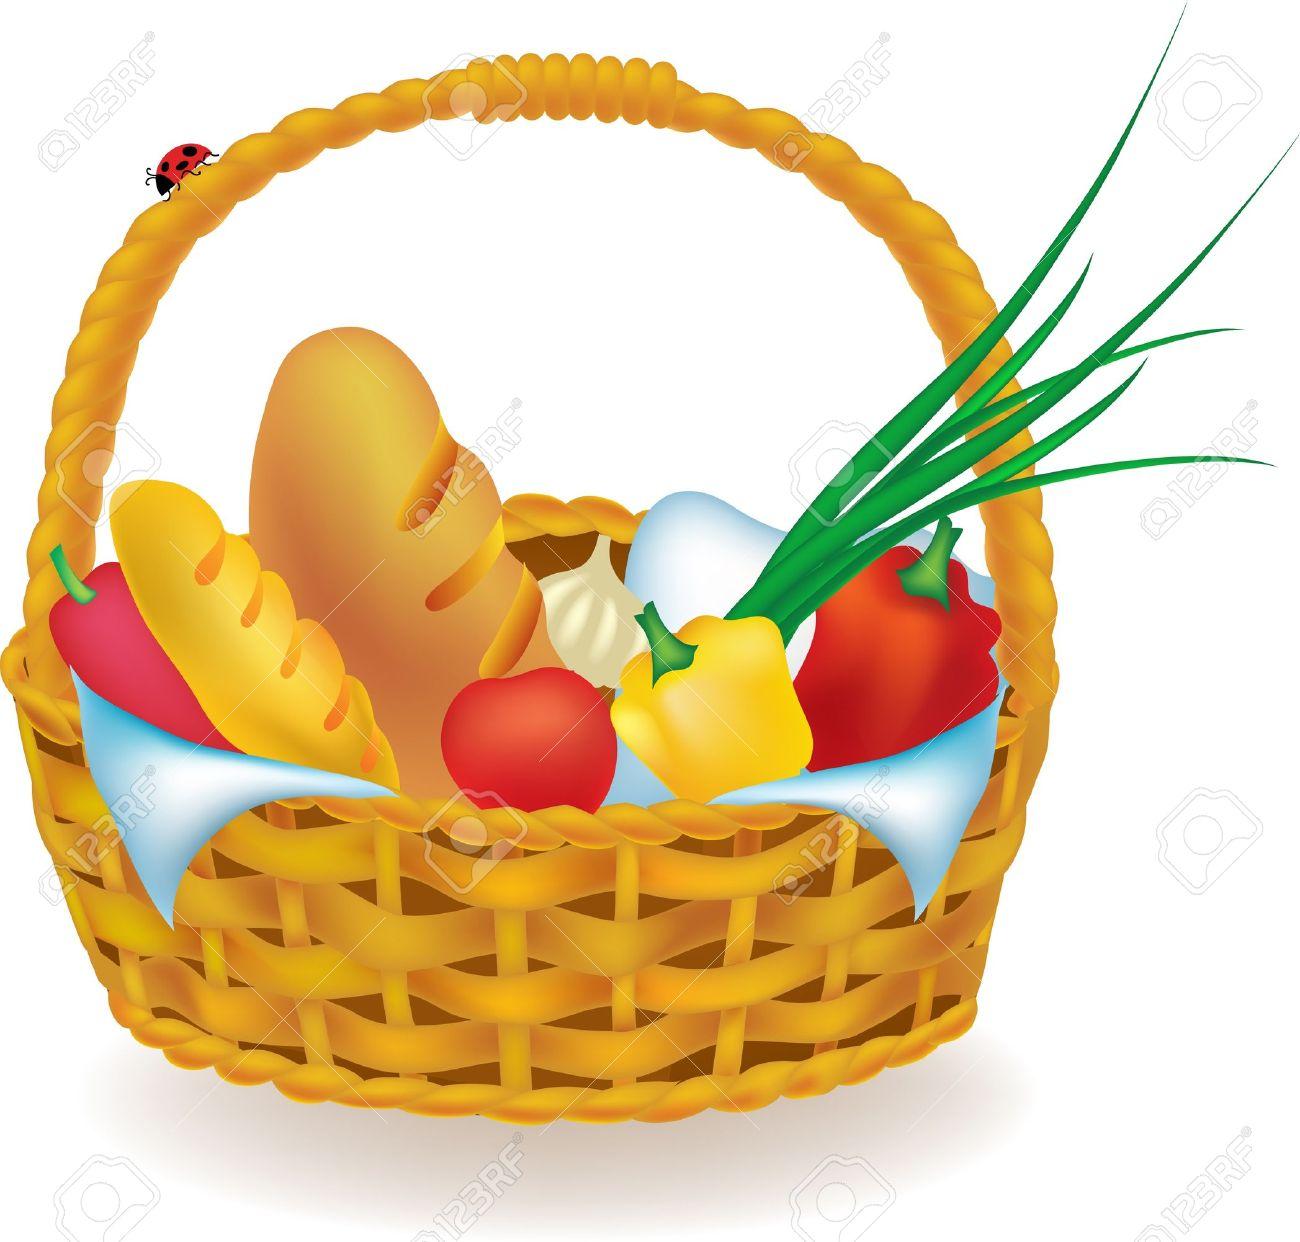 4 943 picnic basket cliparts stock vector and royalty free picnic rh 123rf com yogi bear picnic basket clip art Family Picnic Clip Art